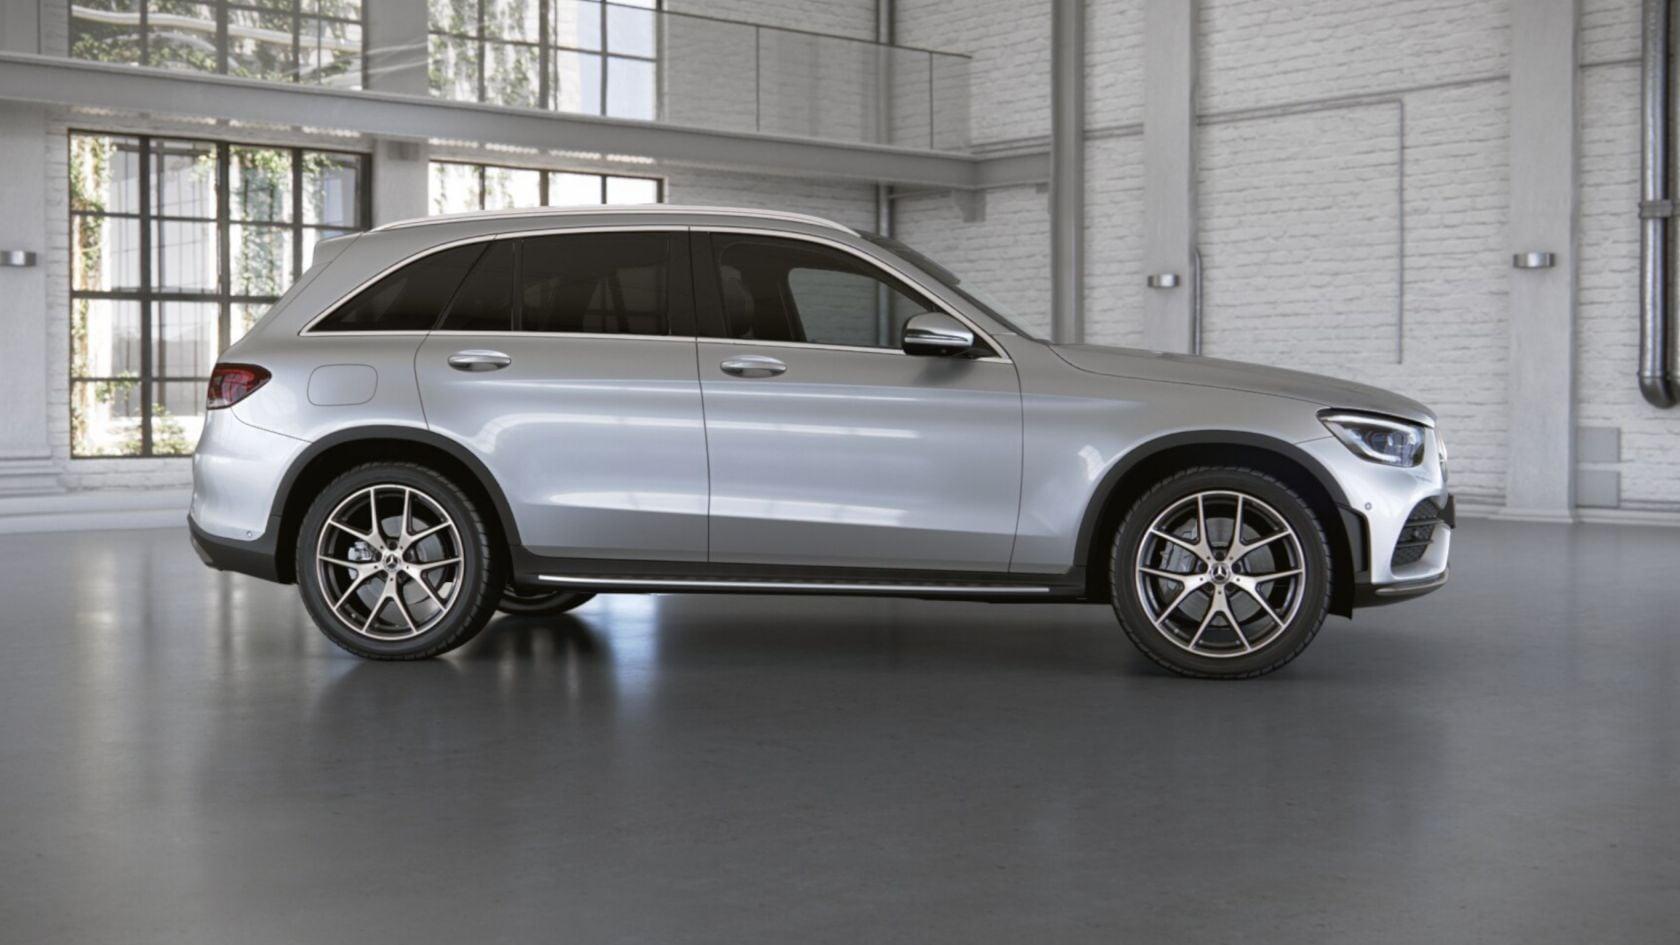 Mercedes Benz Glc Suv Models And Equipment